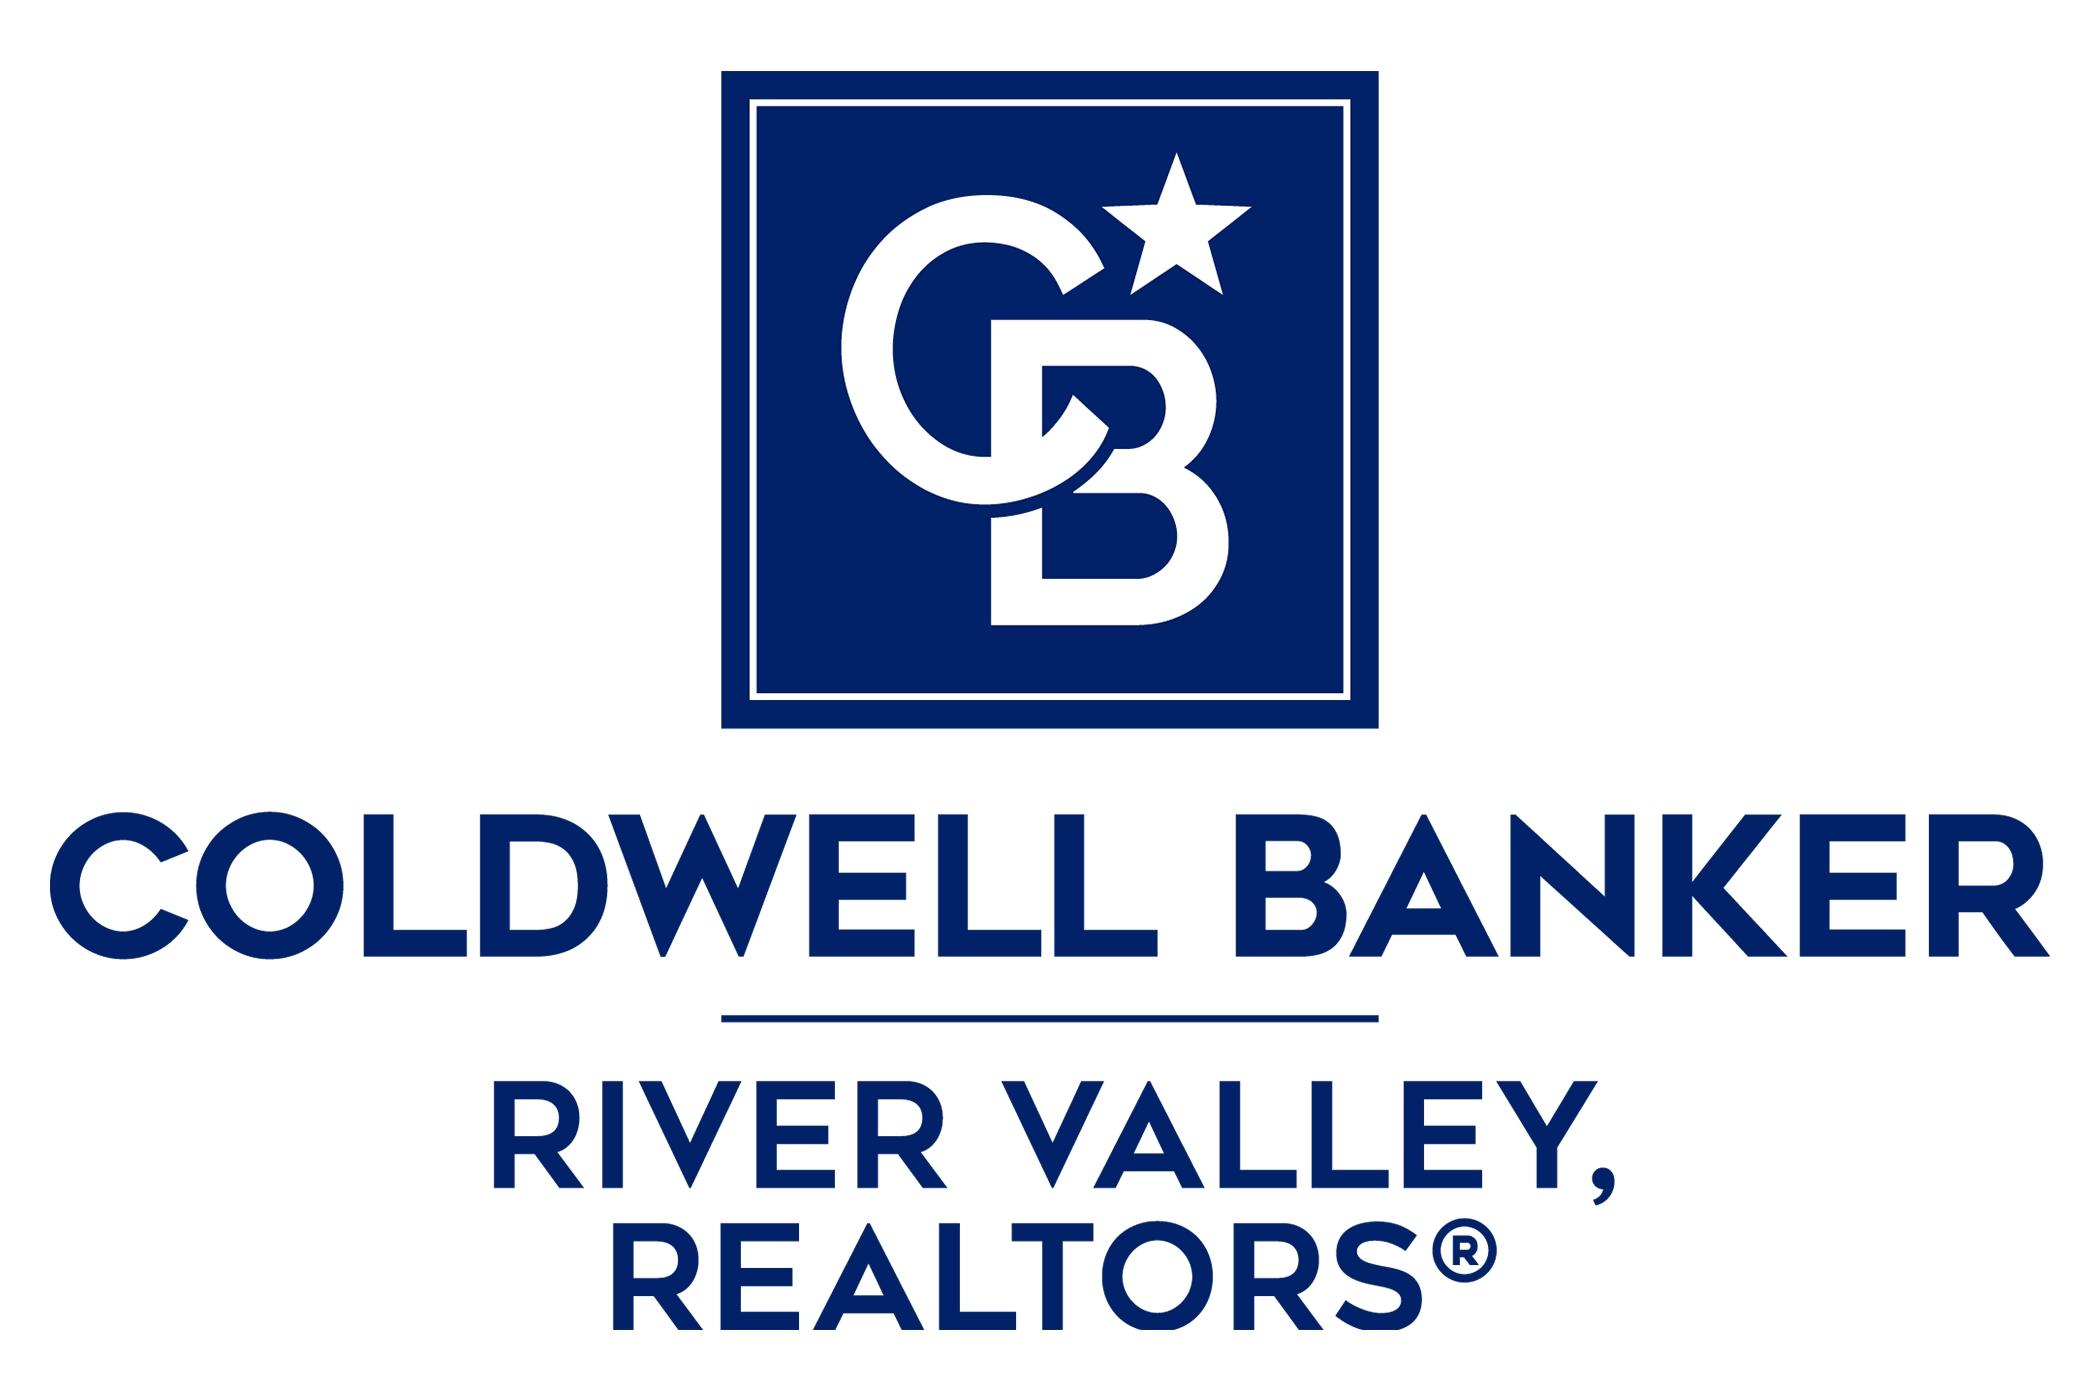 Laura Tralmer - Coldwell Banker River Valley, REALTORS Logo